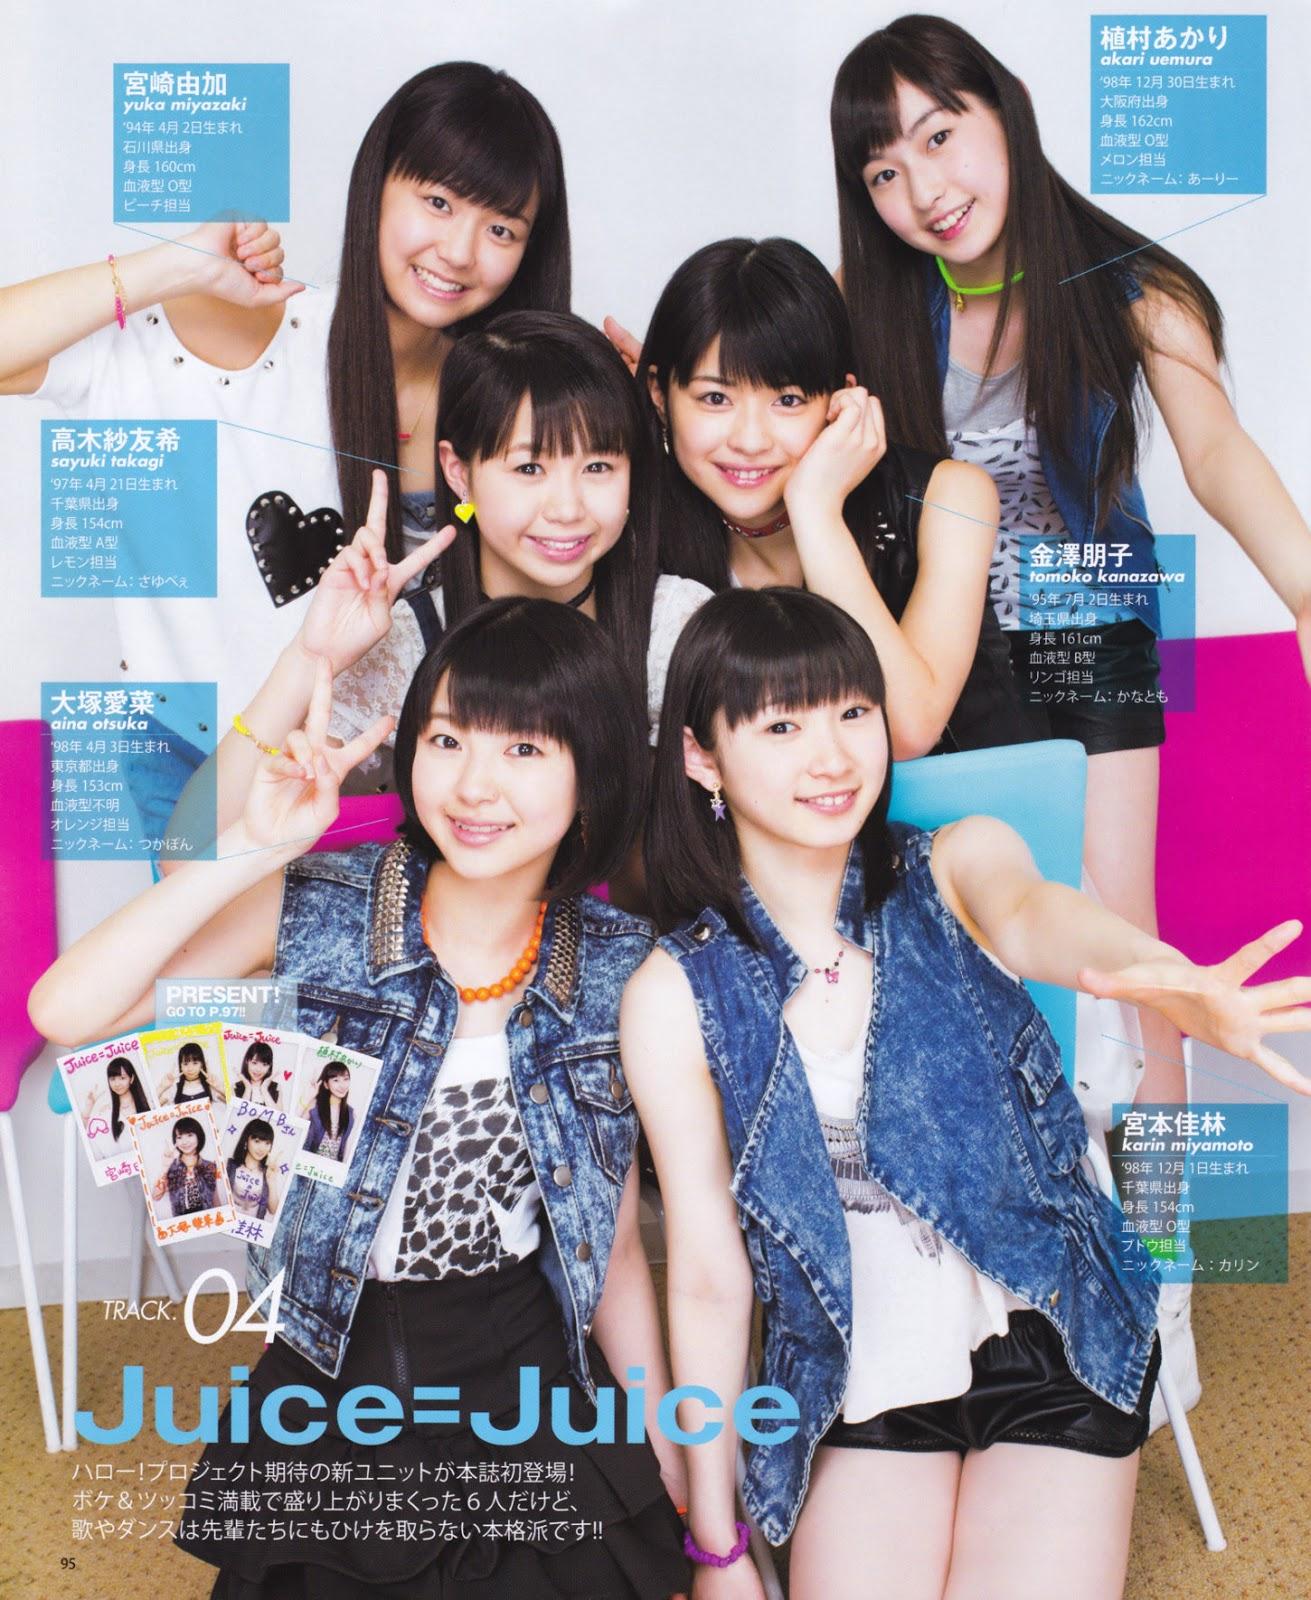 Juice=Juice, Kanazawa Tomoko, Magazine, Miyamoto Karin, Miyazaki Yuka, Otsuka Aina, Takagi Sayuki, Uemura Akari-373482.jpg